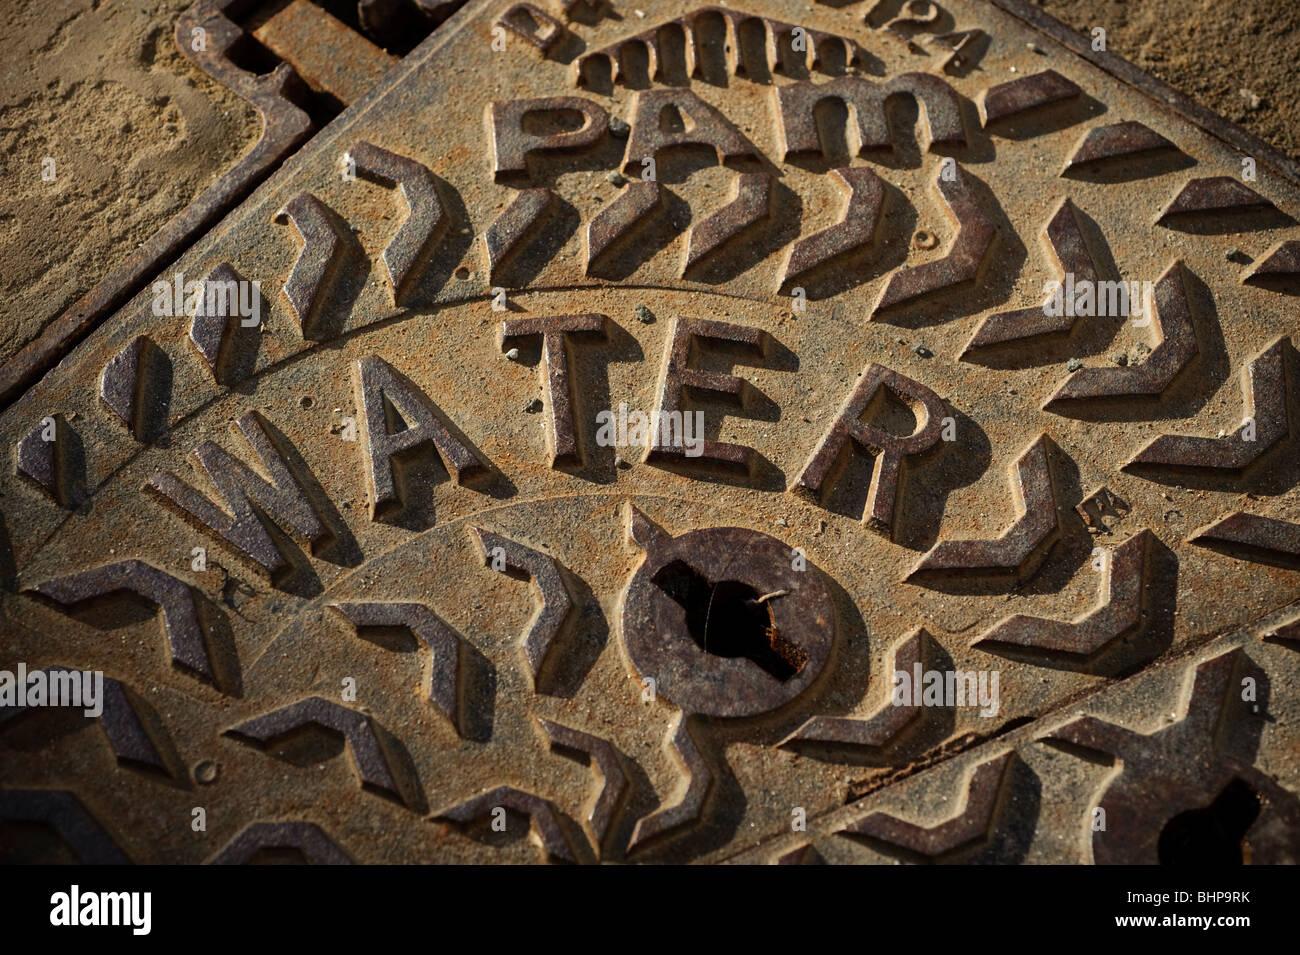 Water main cast iron manhole cover, UK - Stock Image